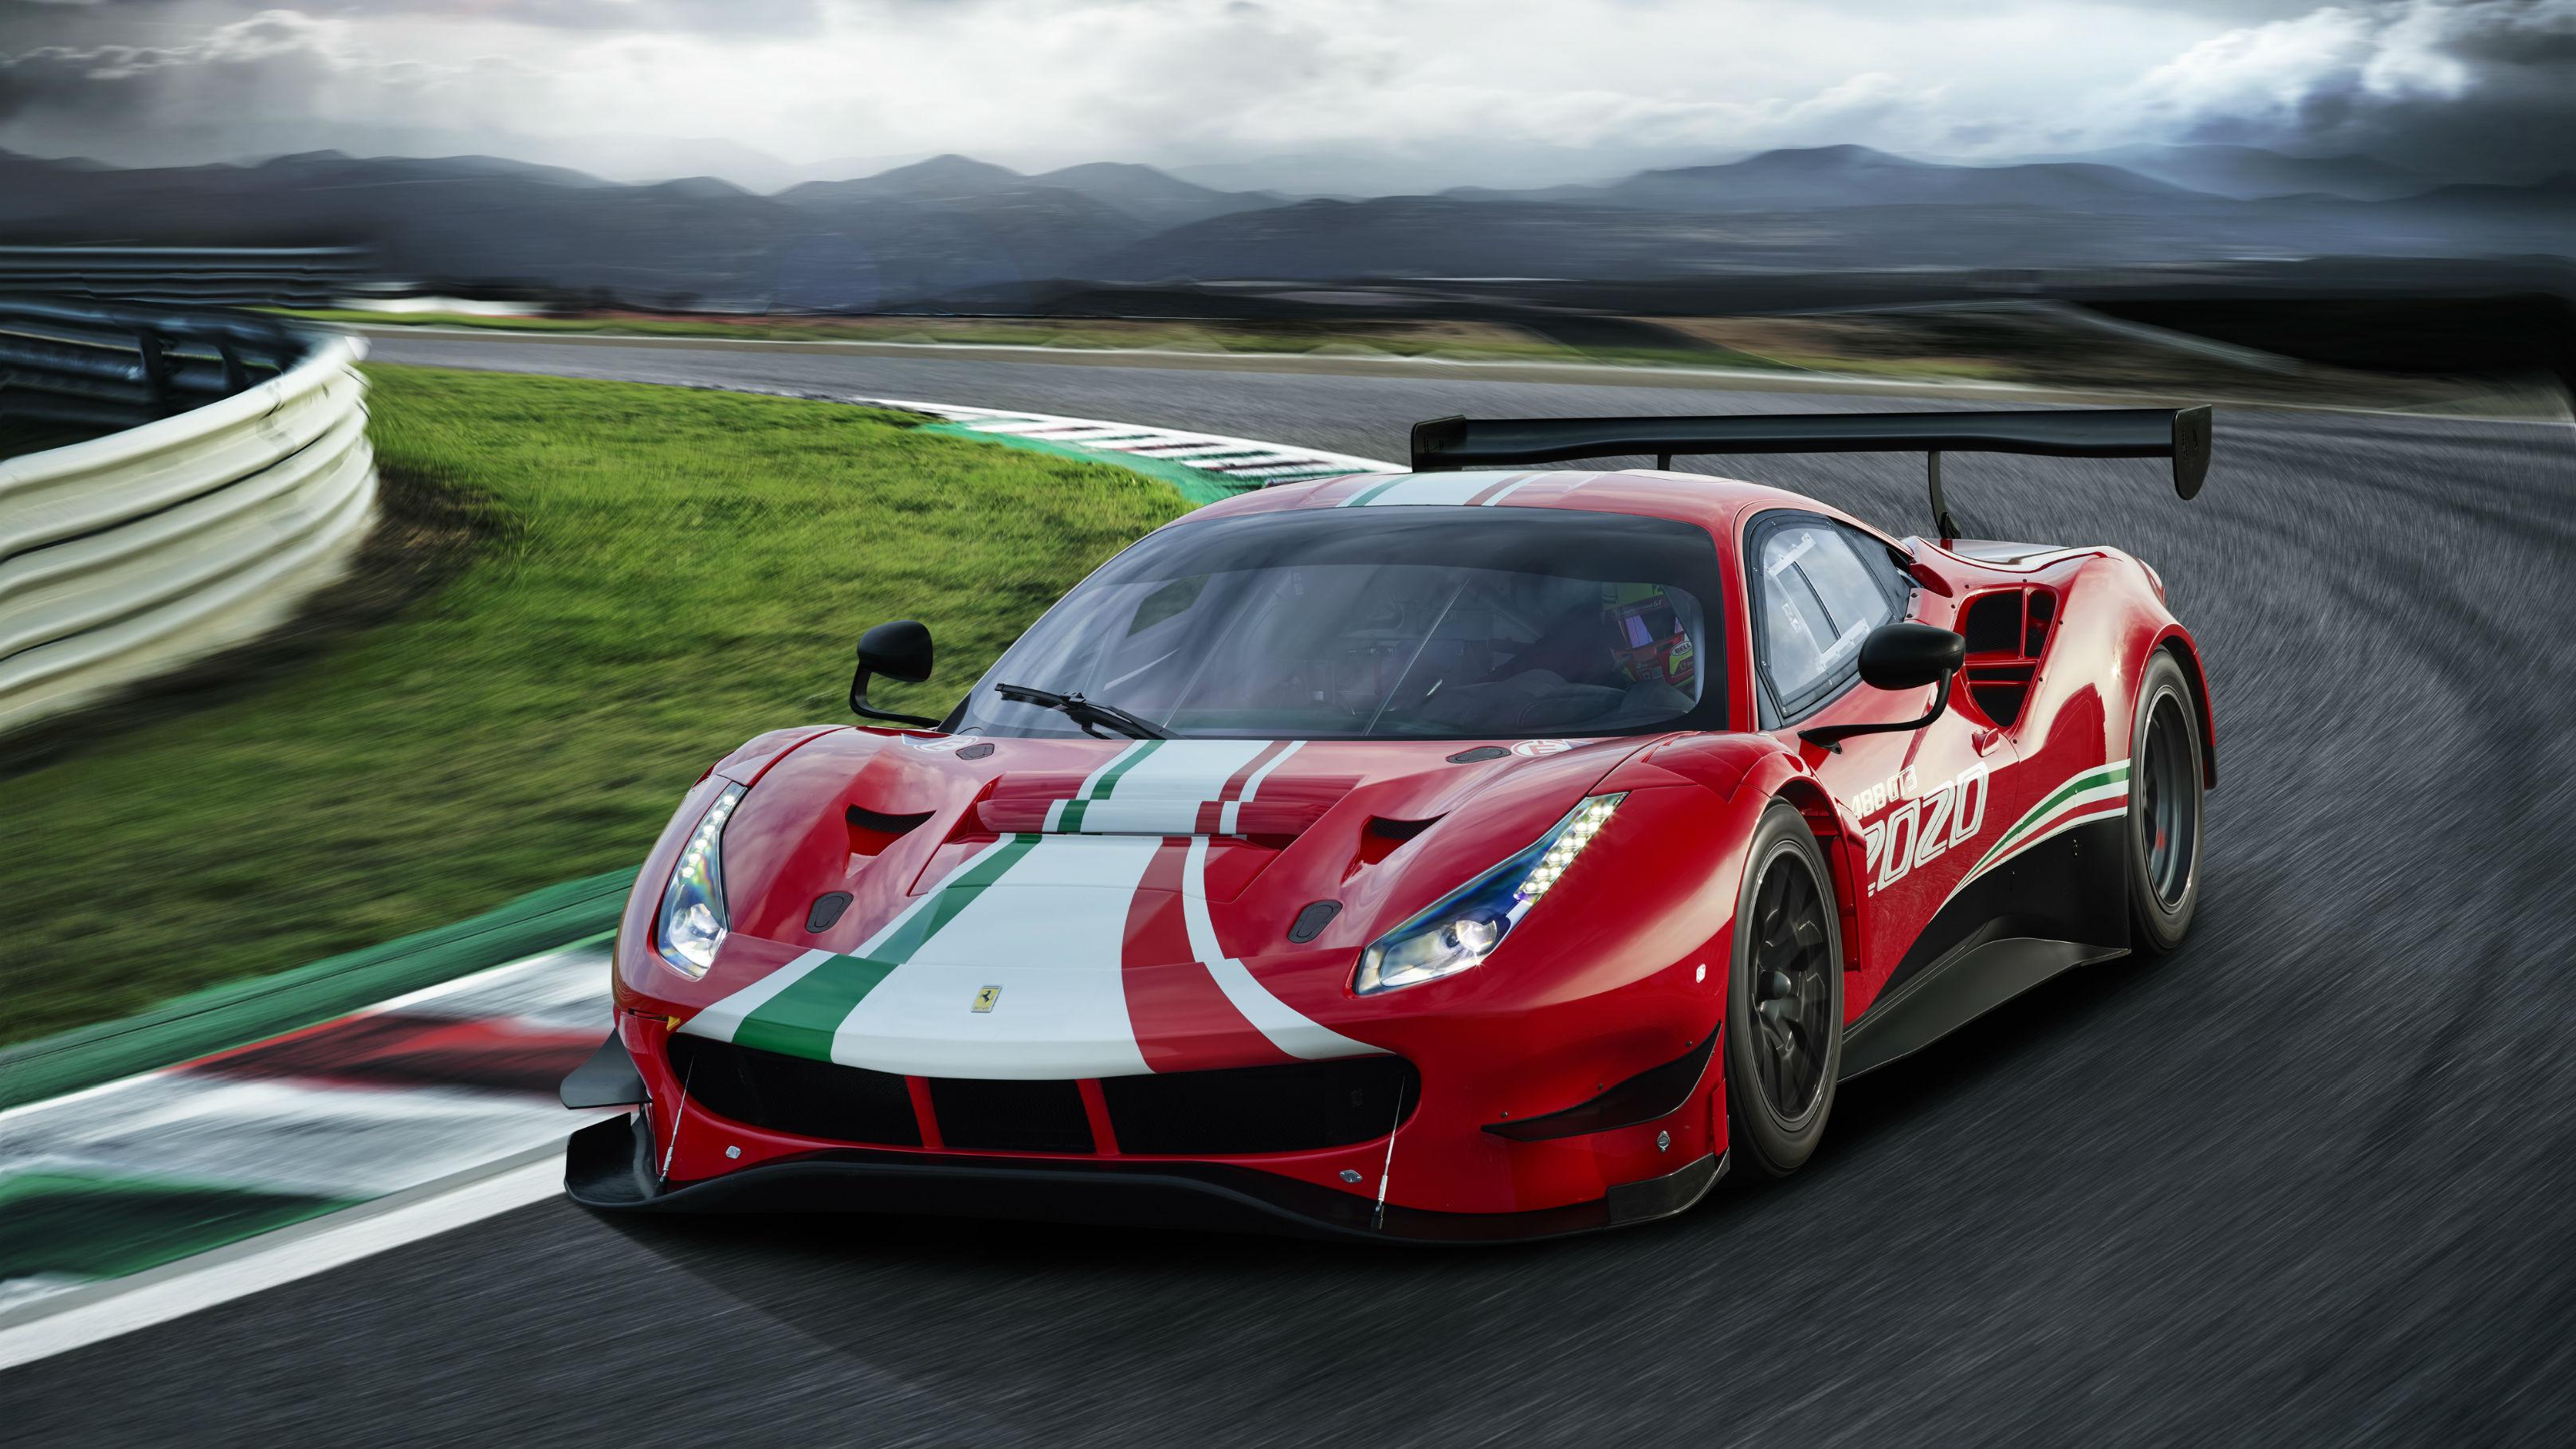 Ferrari 488 GT3 Evo ready to Race \u2013 WHEELS.ca